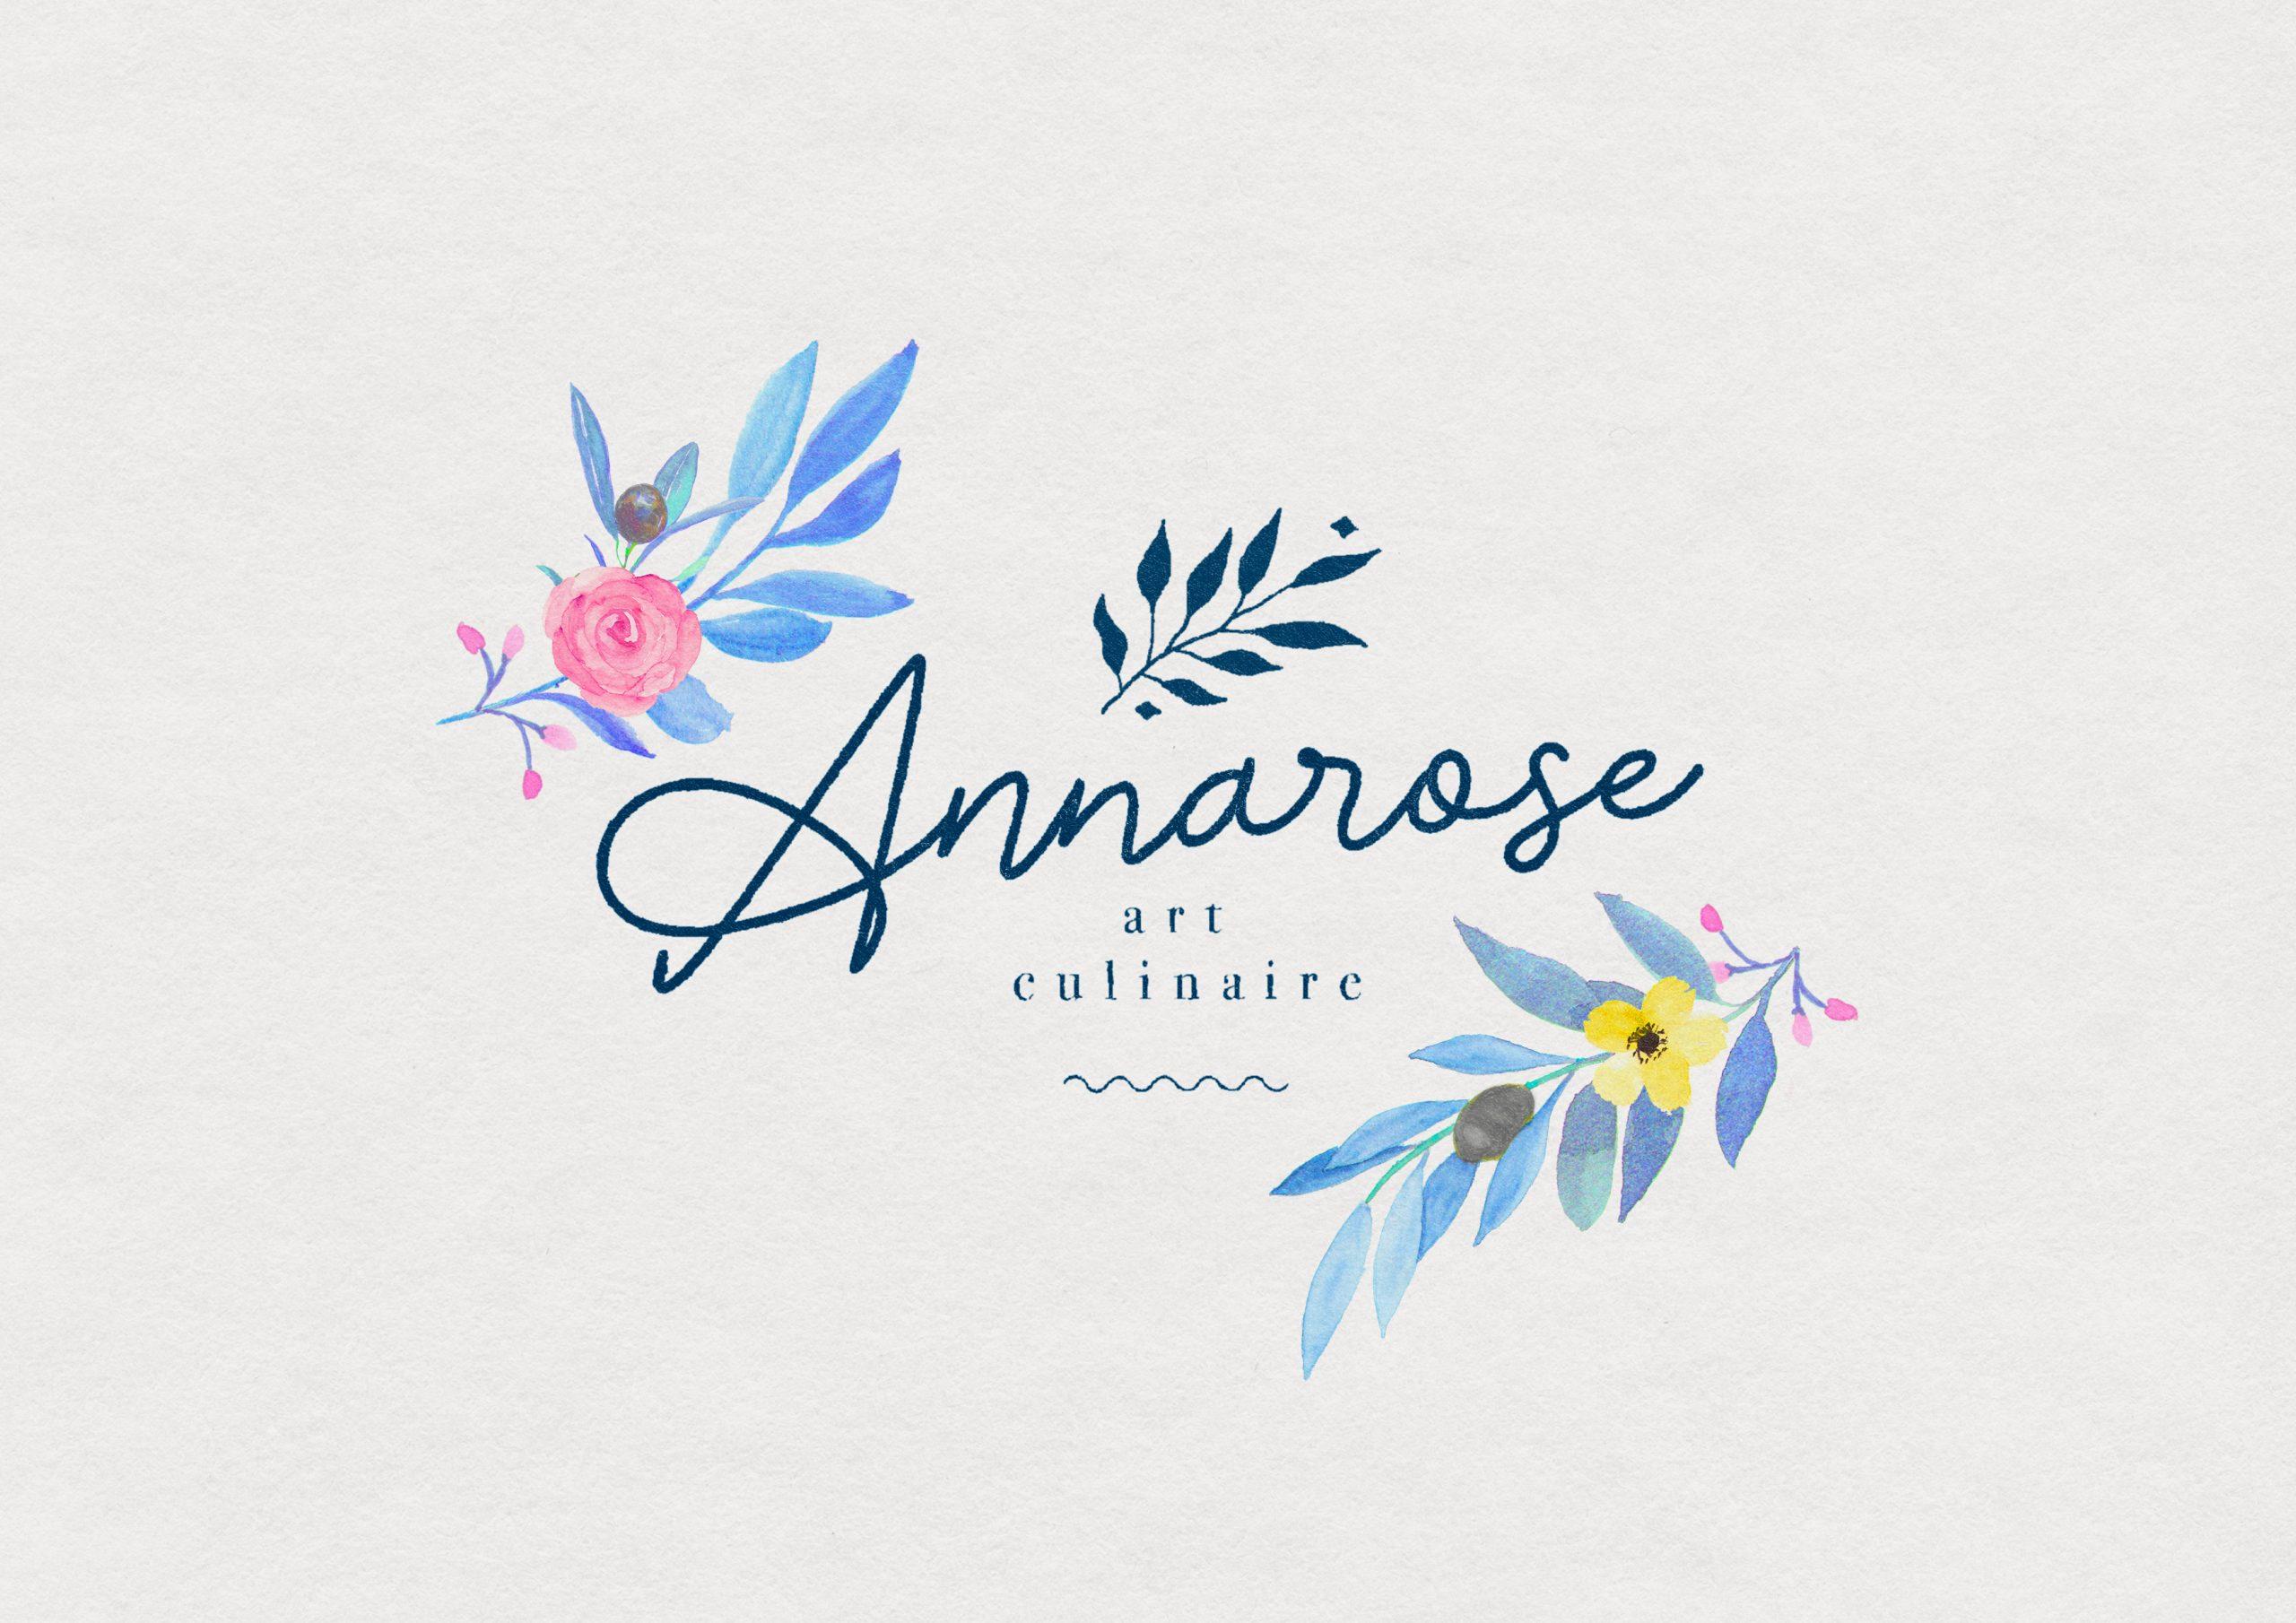 Annarose